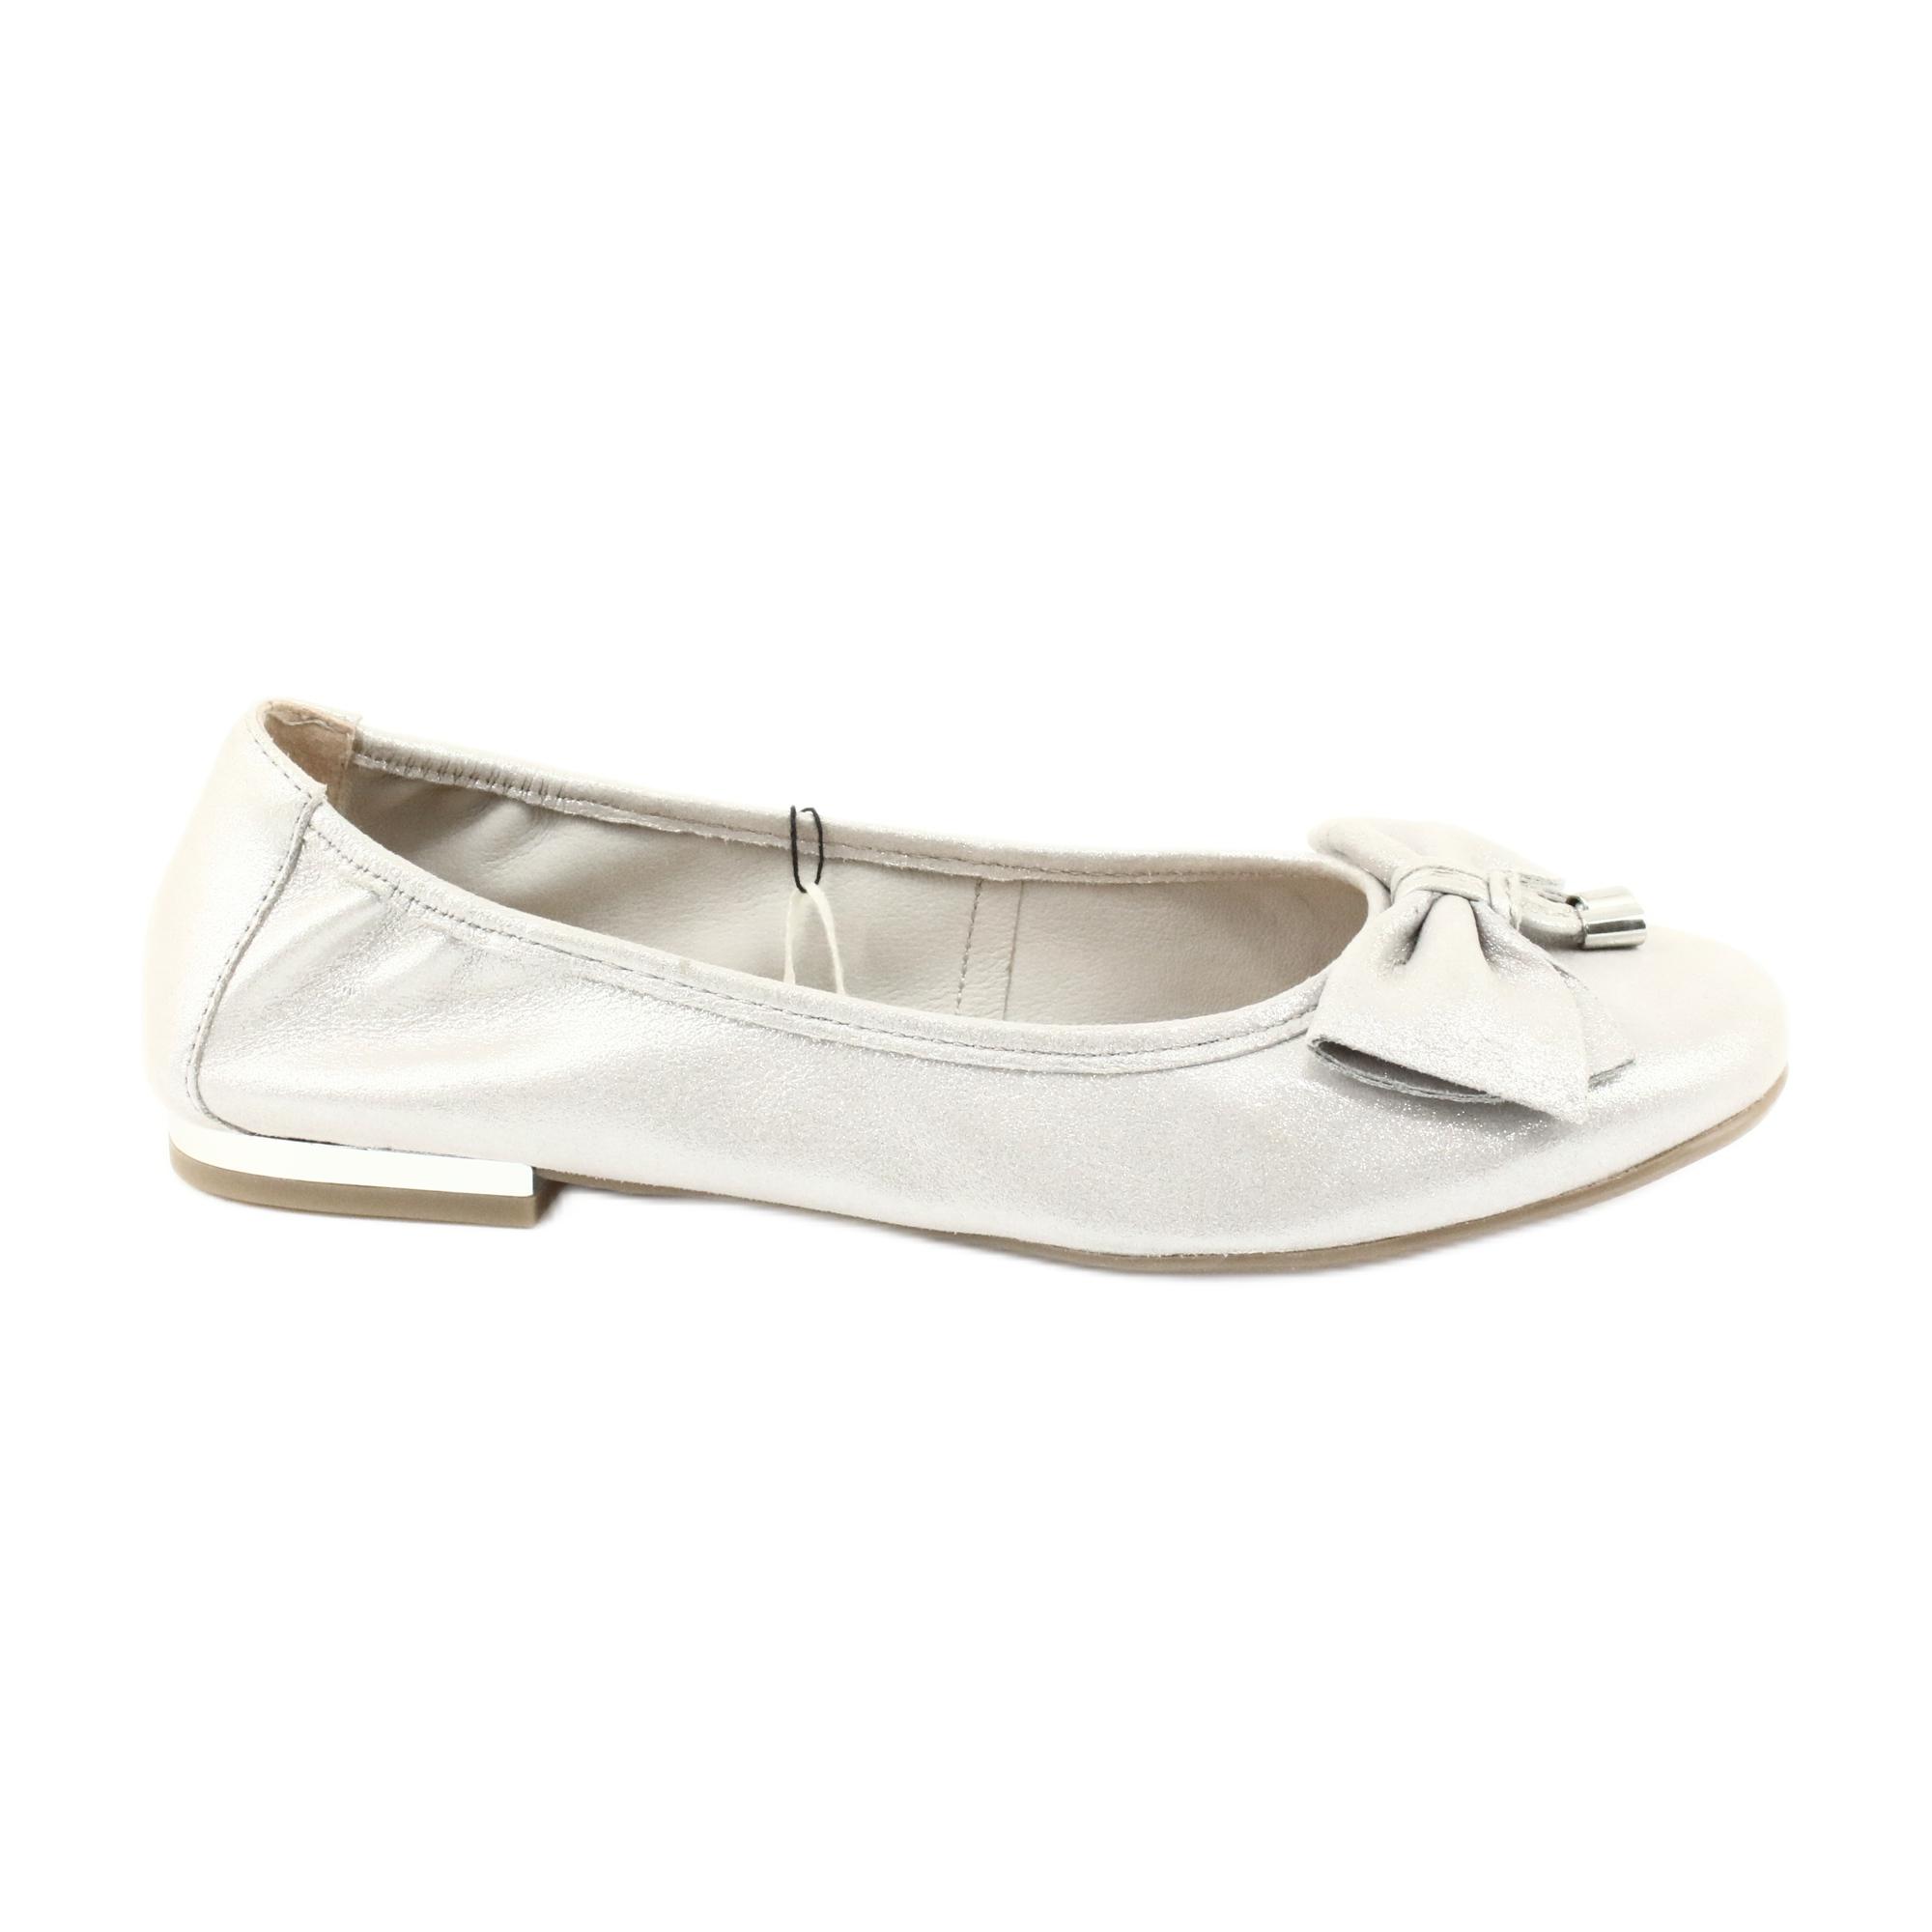 Caprice Ballerinas Schuhe 22111 Silber grau